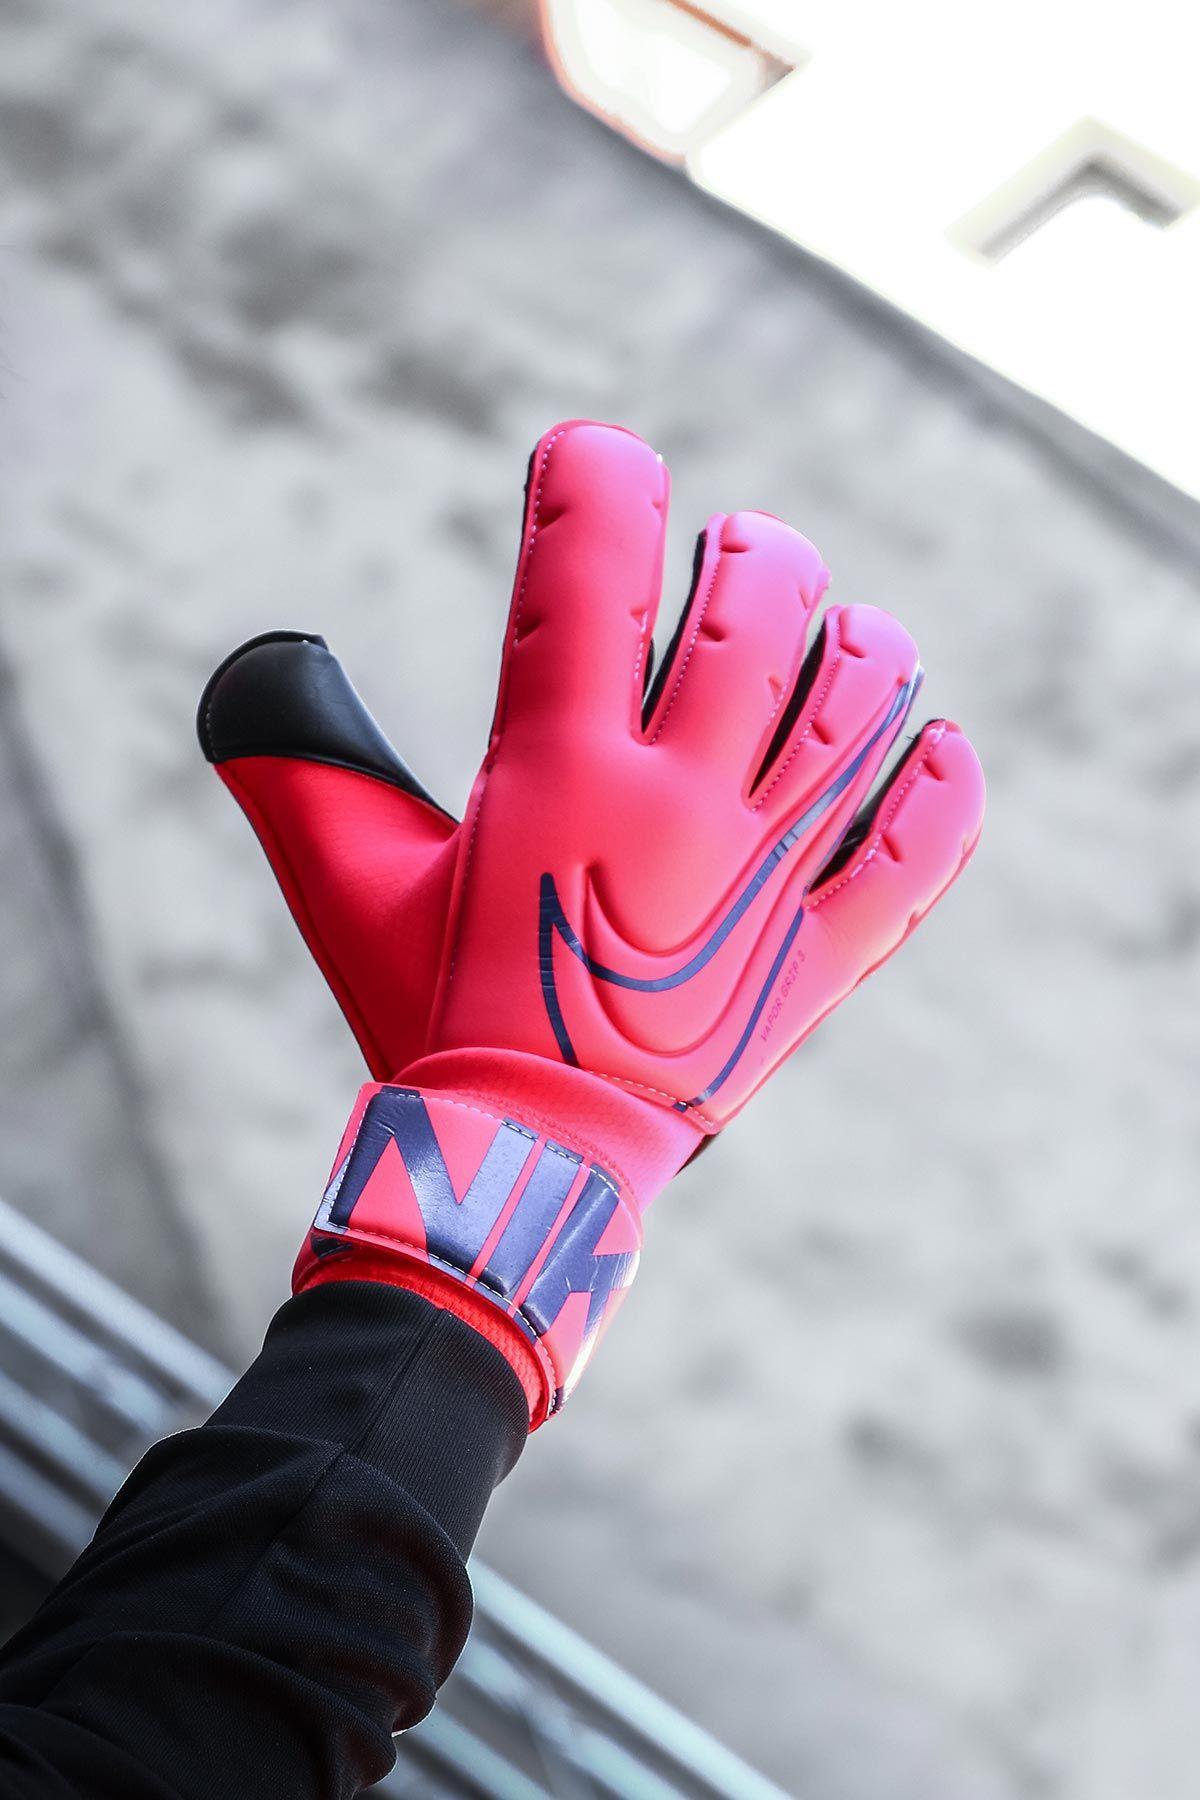 abajo Remontarse Caramelo  Nike GK Vapor Grip3 | Guantes de fútbol, Portero de futbol, Arquero de  futbol